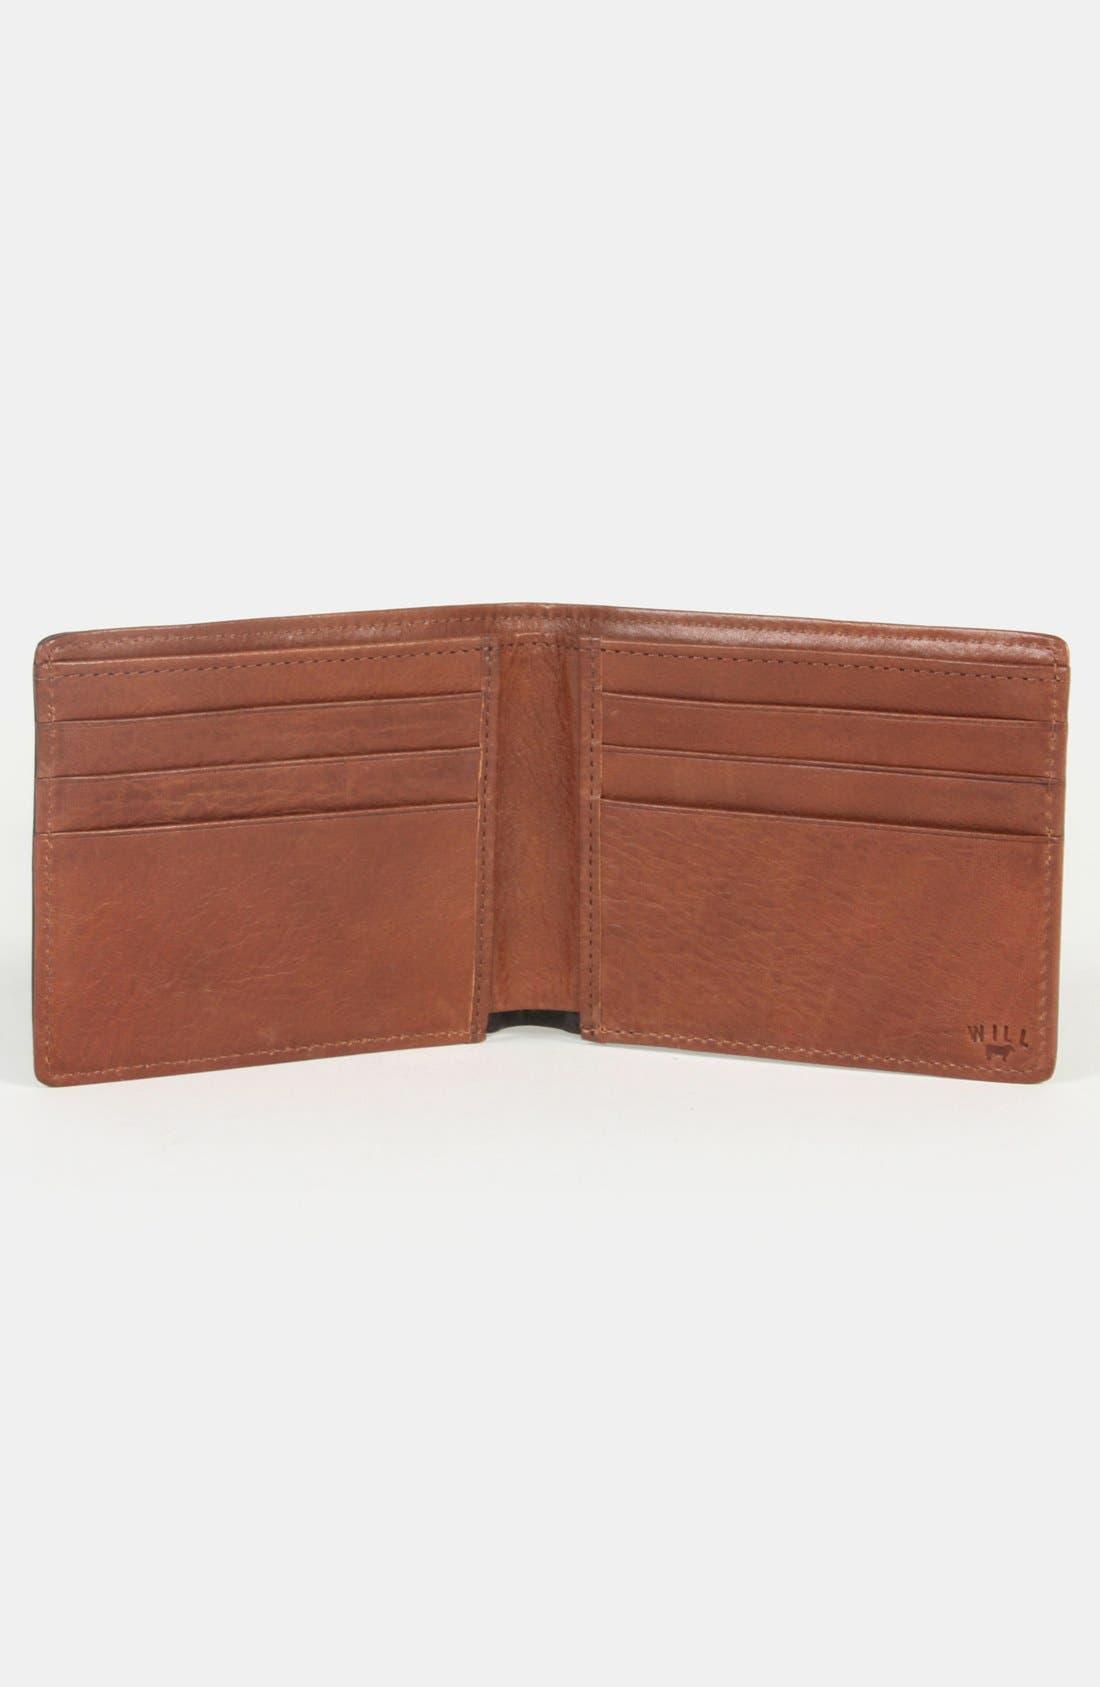 WILL LEATHER GOODS,                             'Barnard' Wallet,                             Alternate thumbnail 4, color,                             001